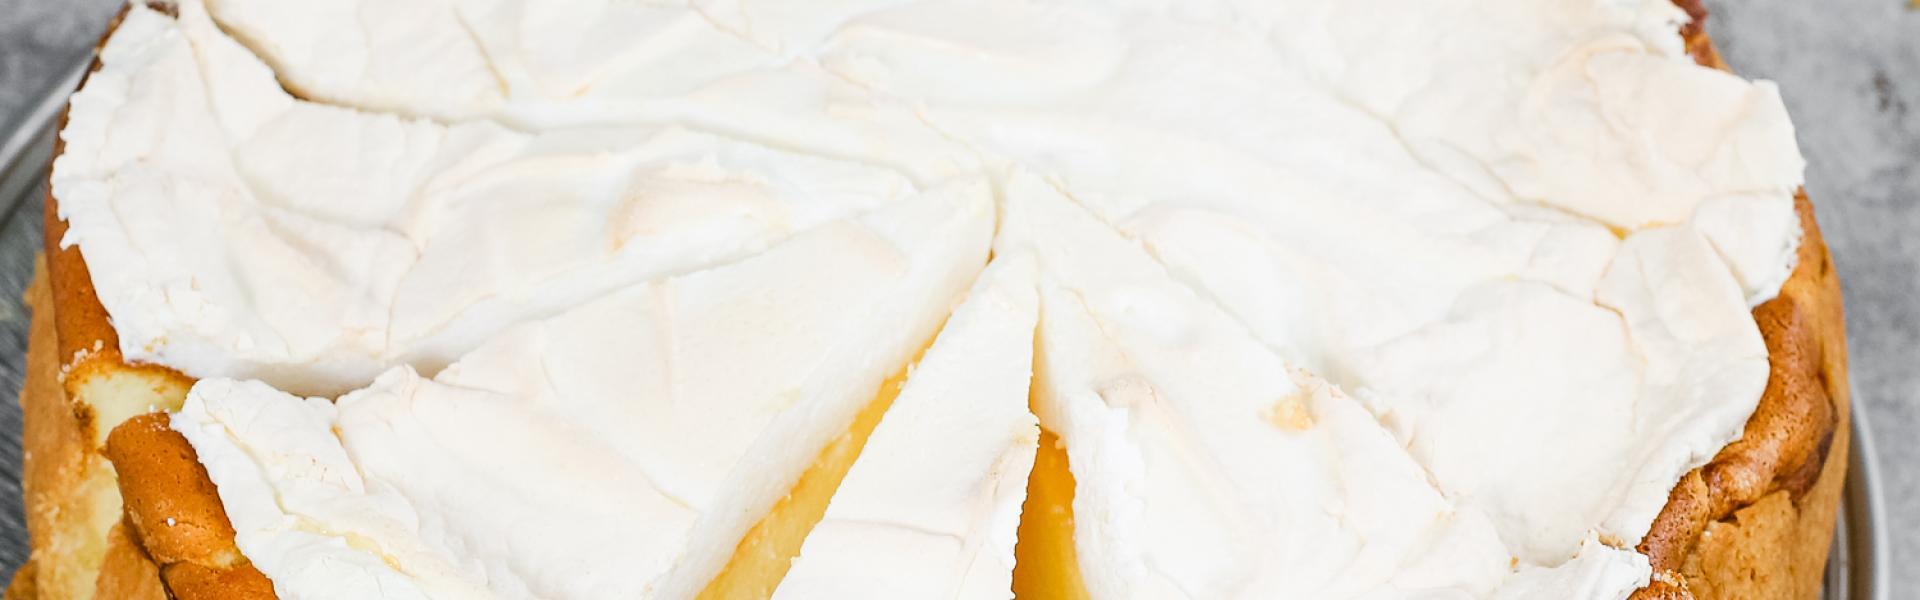 Käsekuchen mit Baiserhaube aka Tränenkuchen angeschnitten